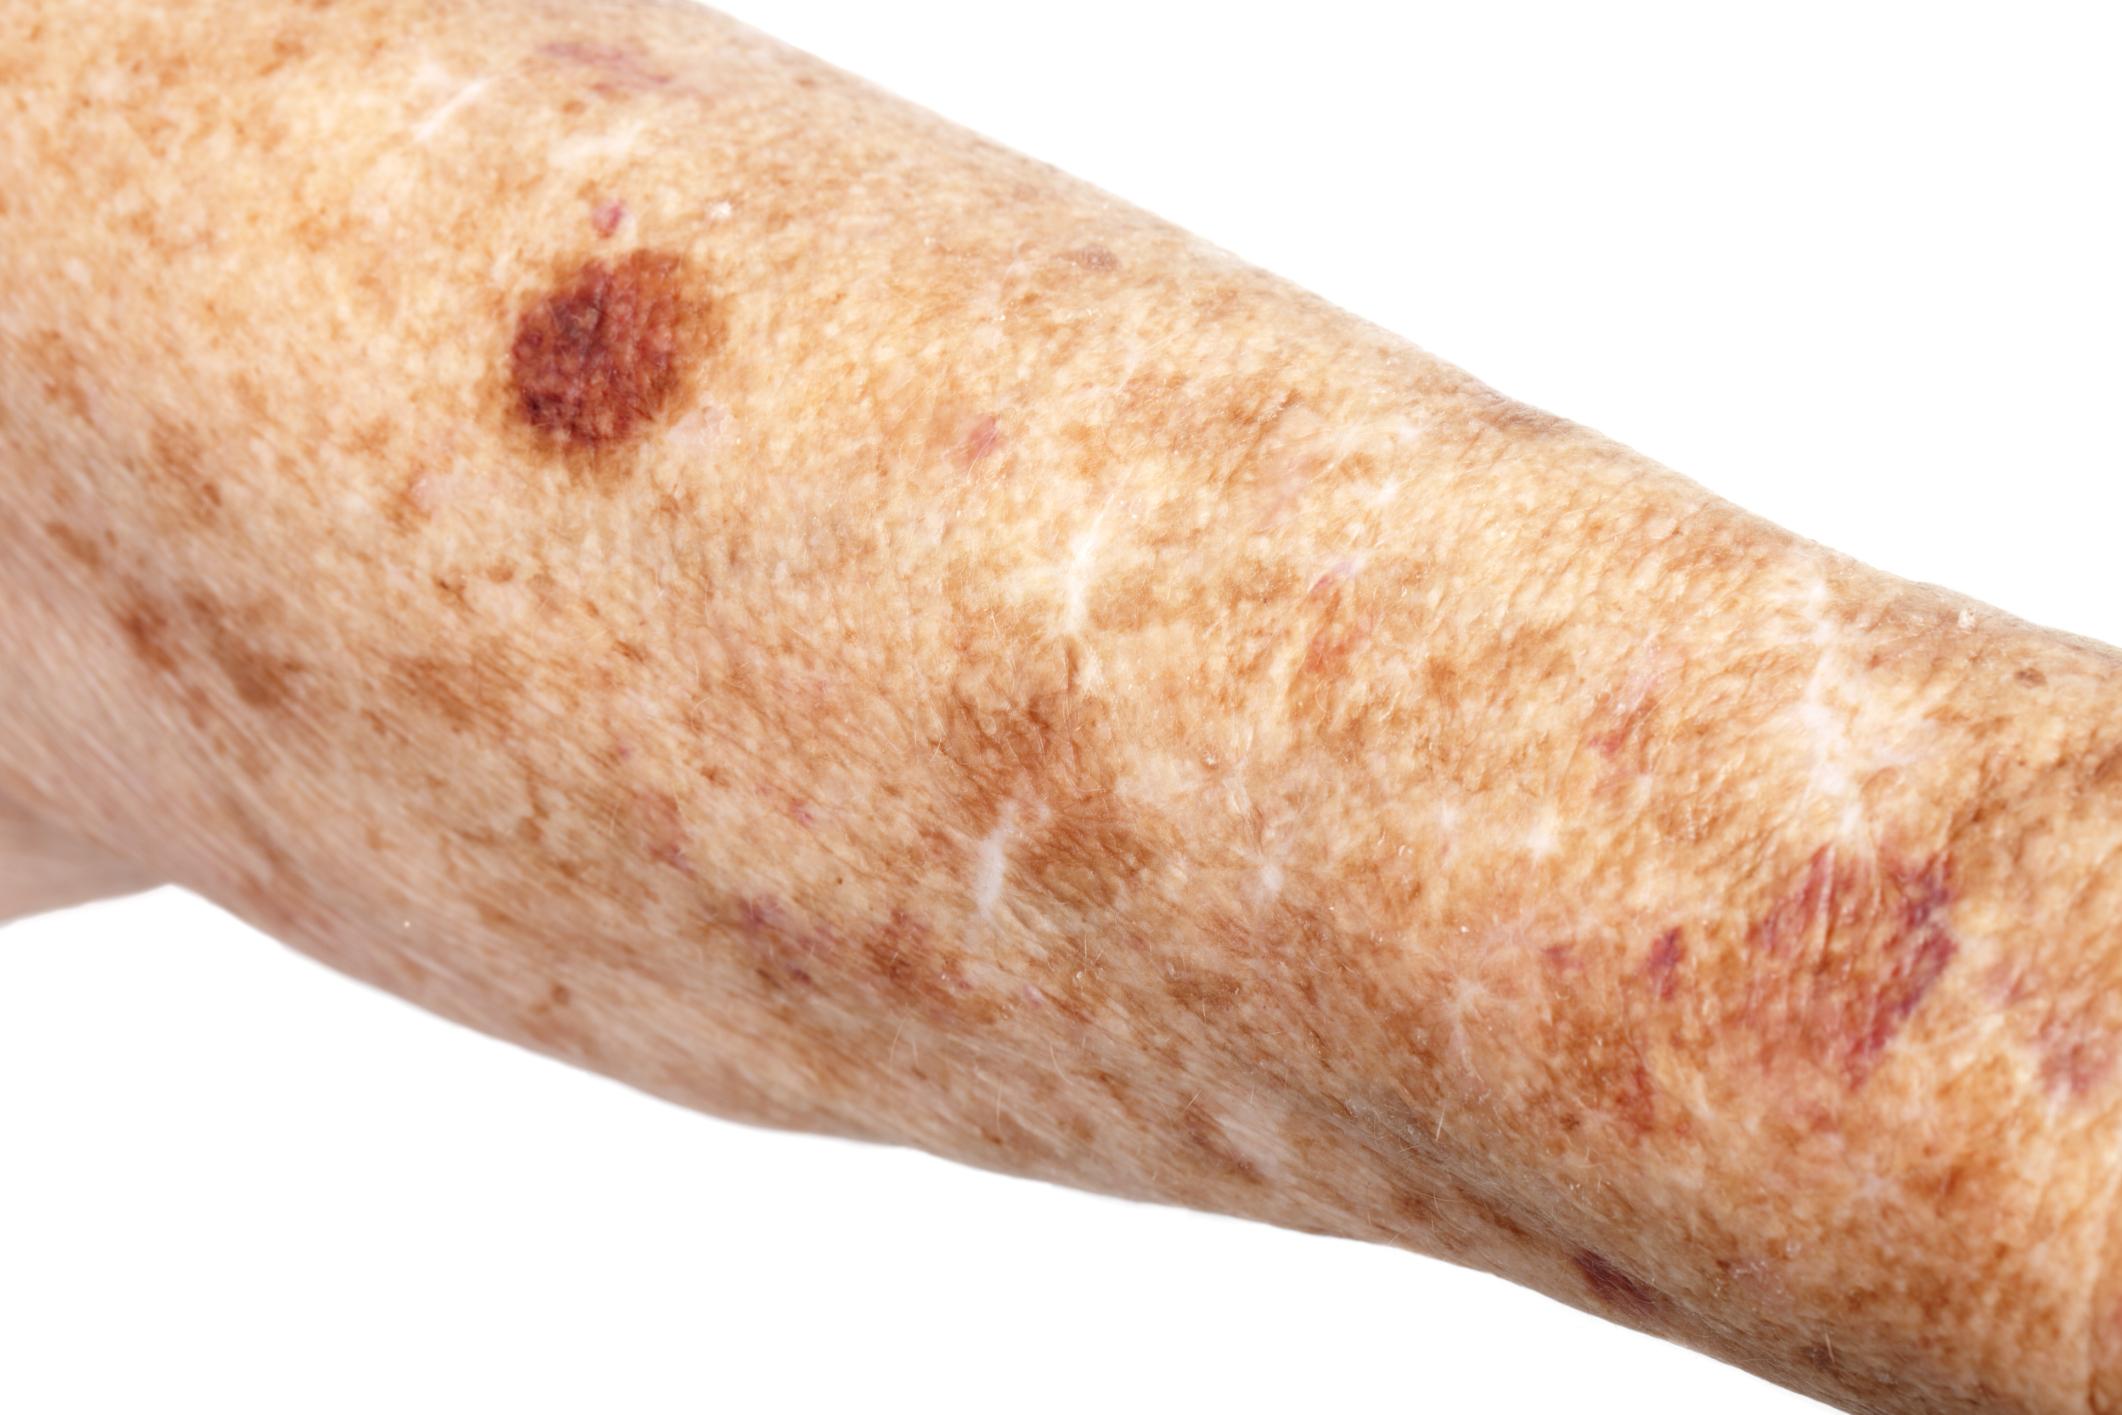 Natural Wart & Mole Remover